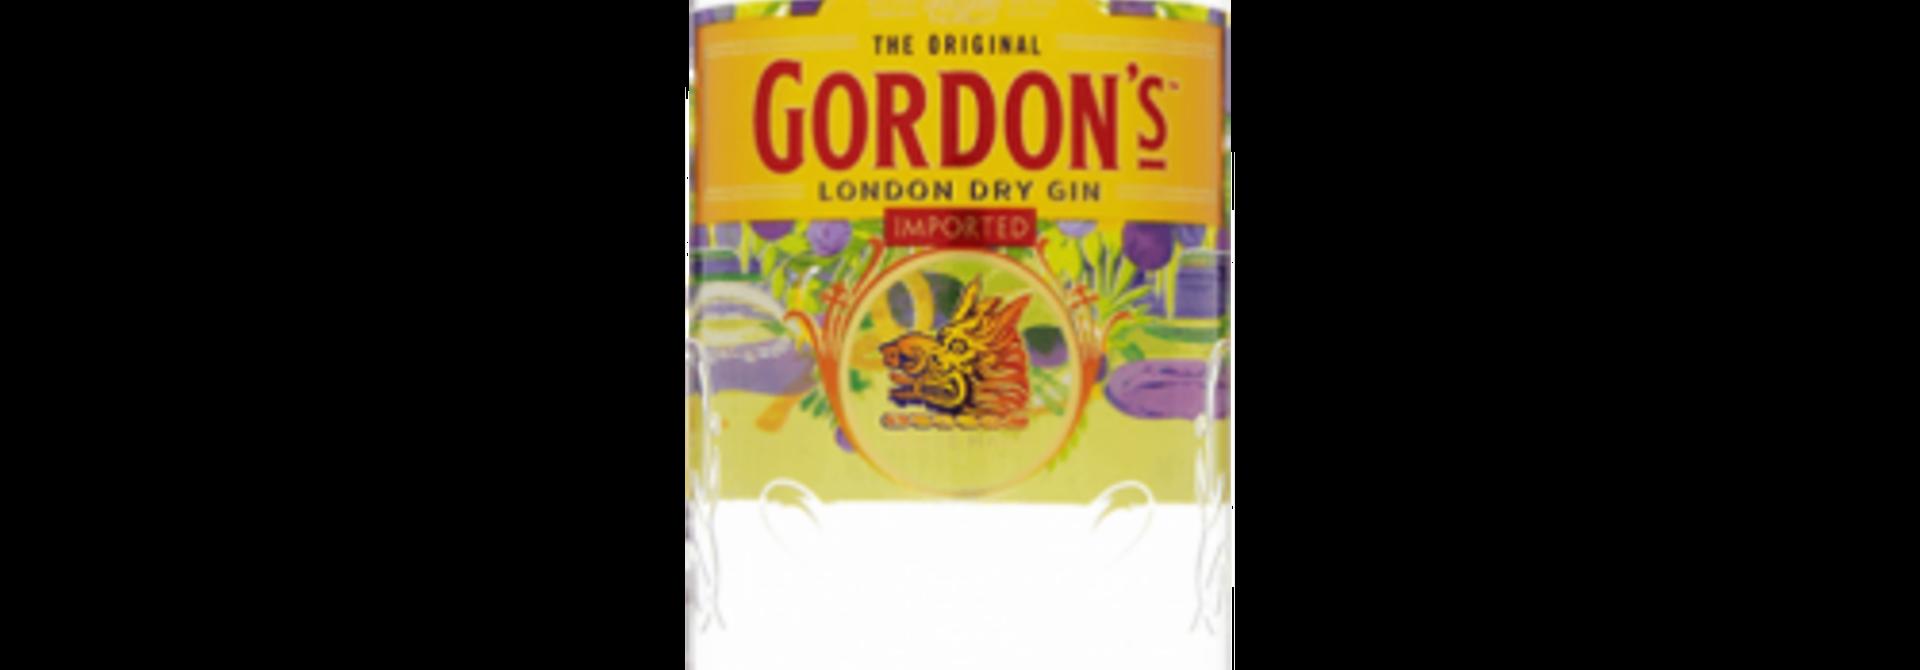 GORDON dry gin 1.0ltr